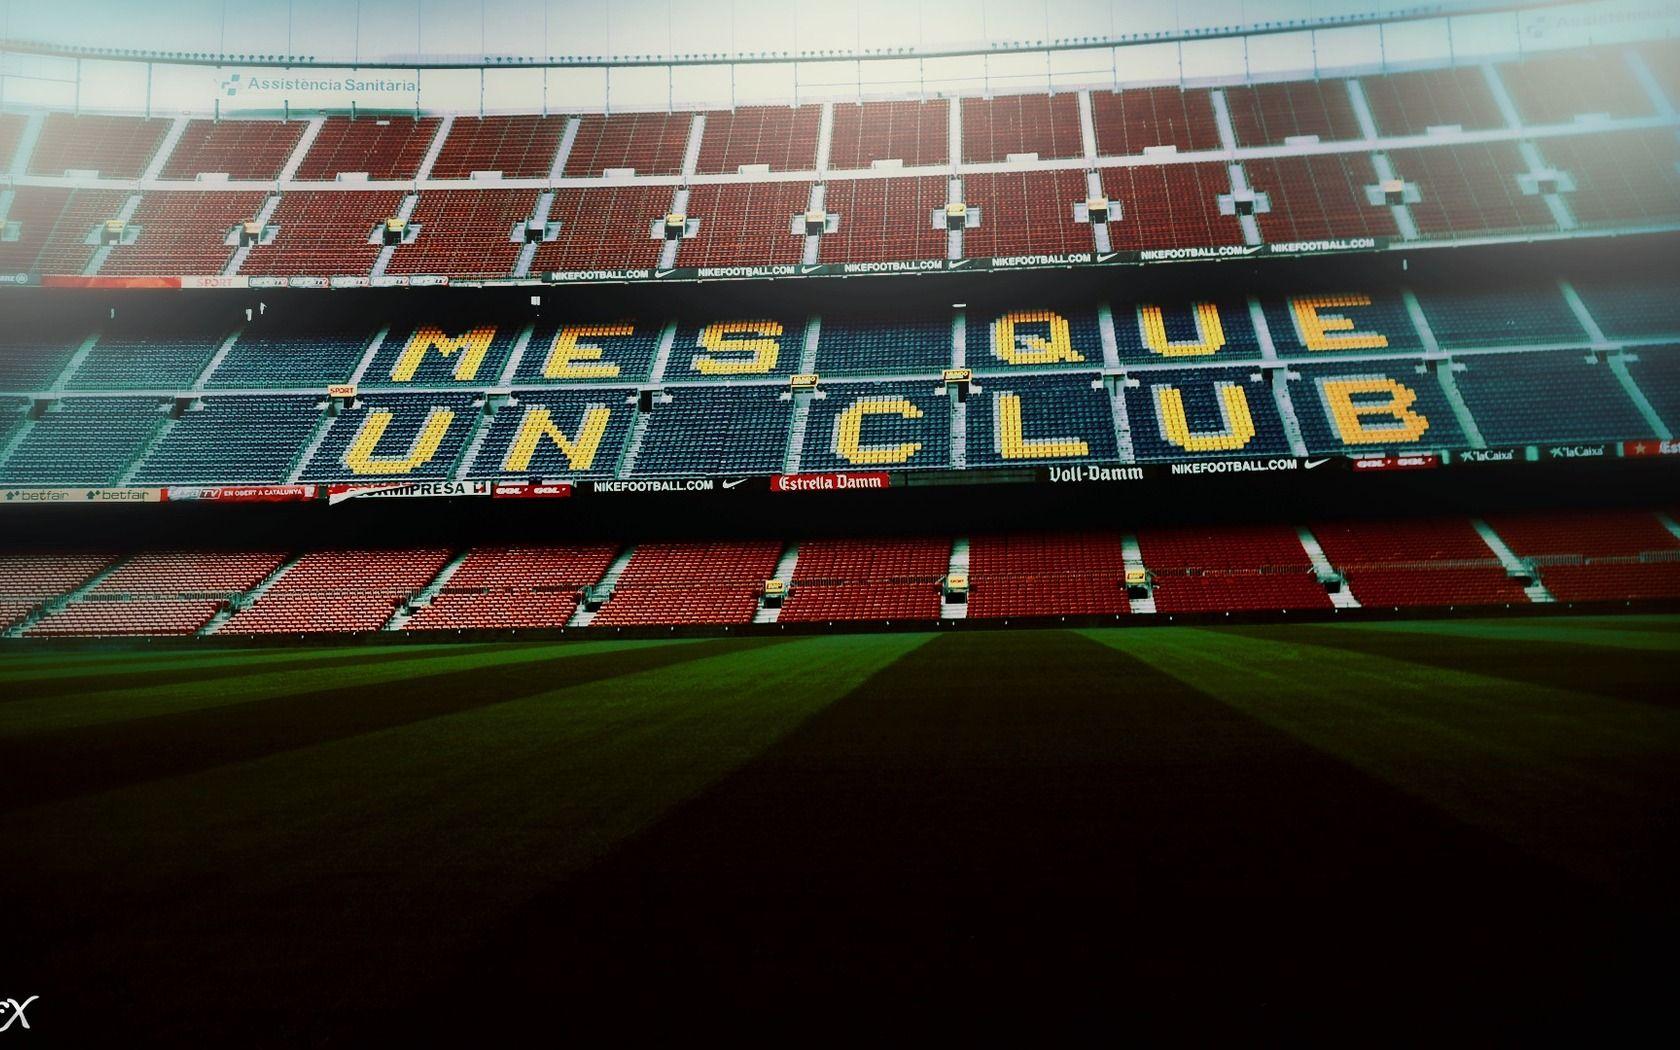 Fonds dcran Camp Nou tous les wallpapers Camp Nou 1680x1050